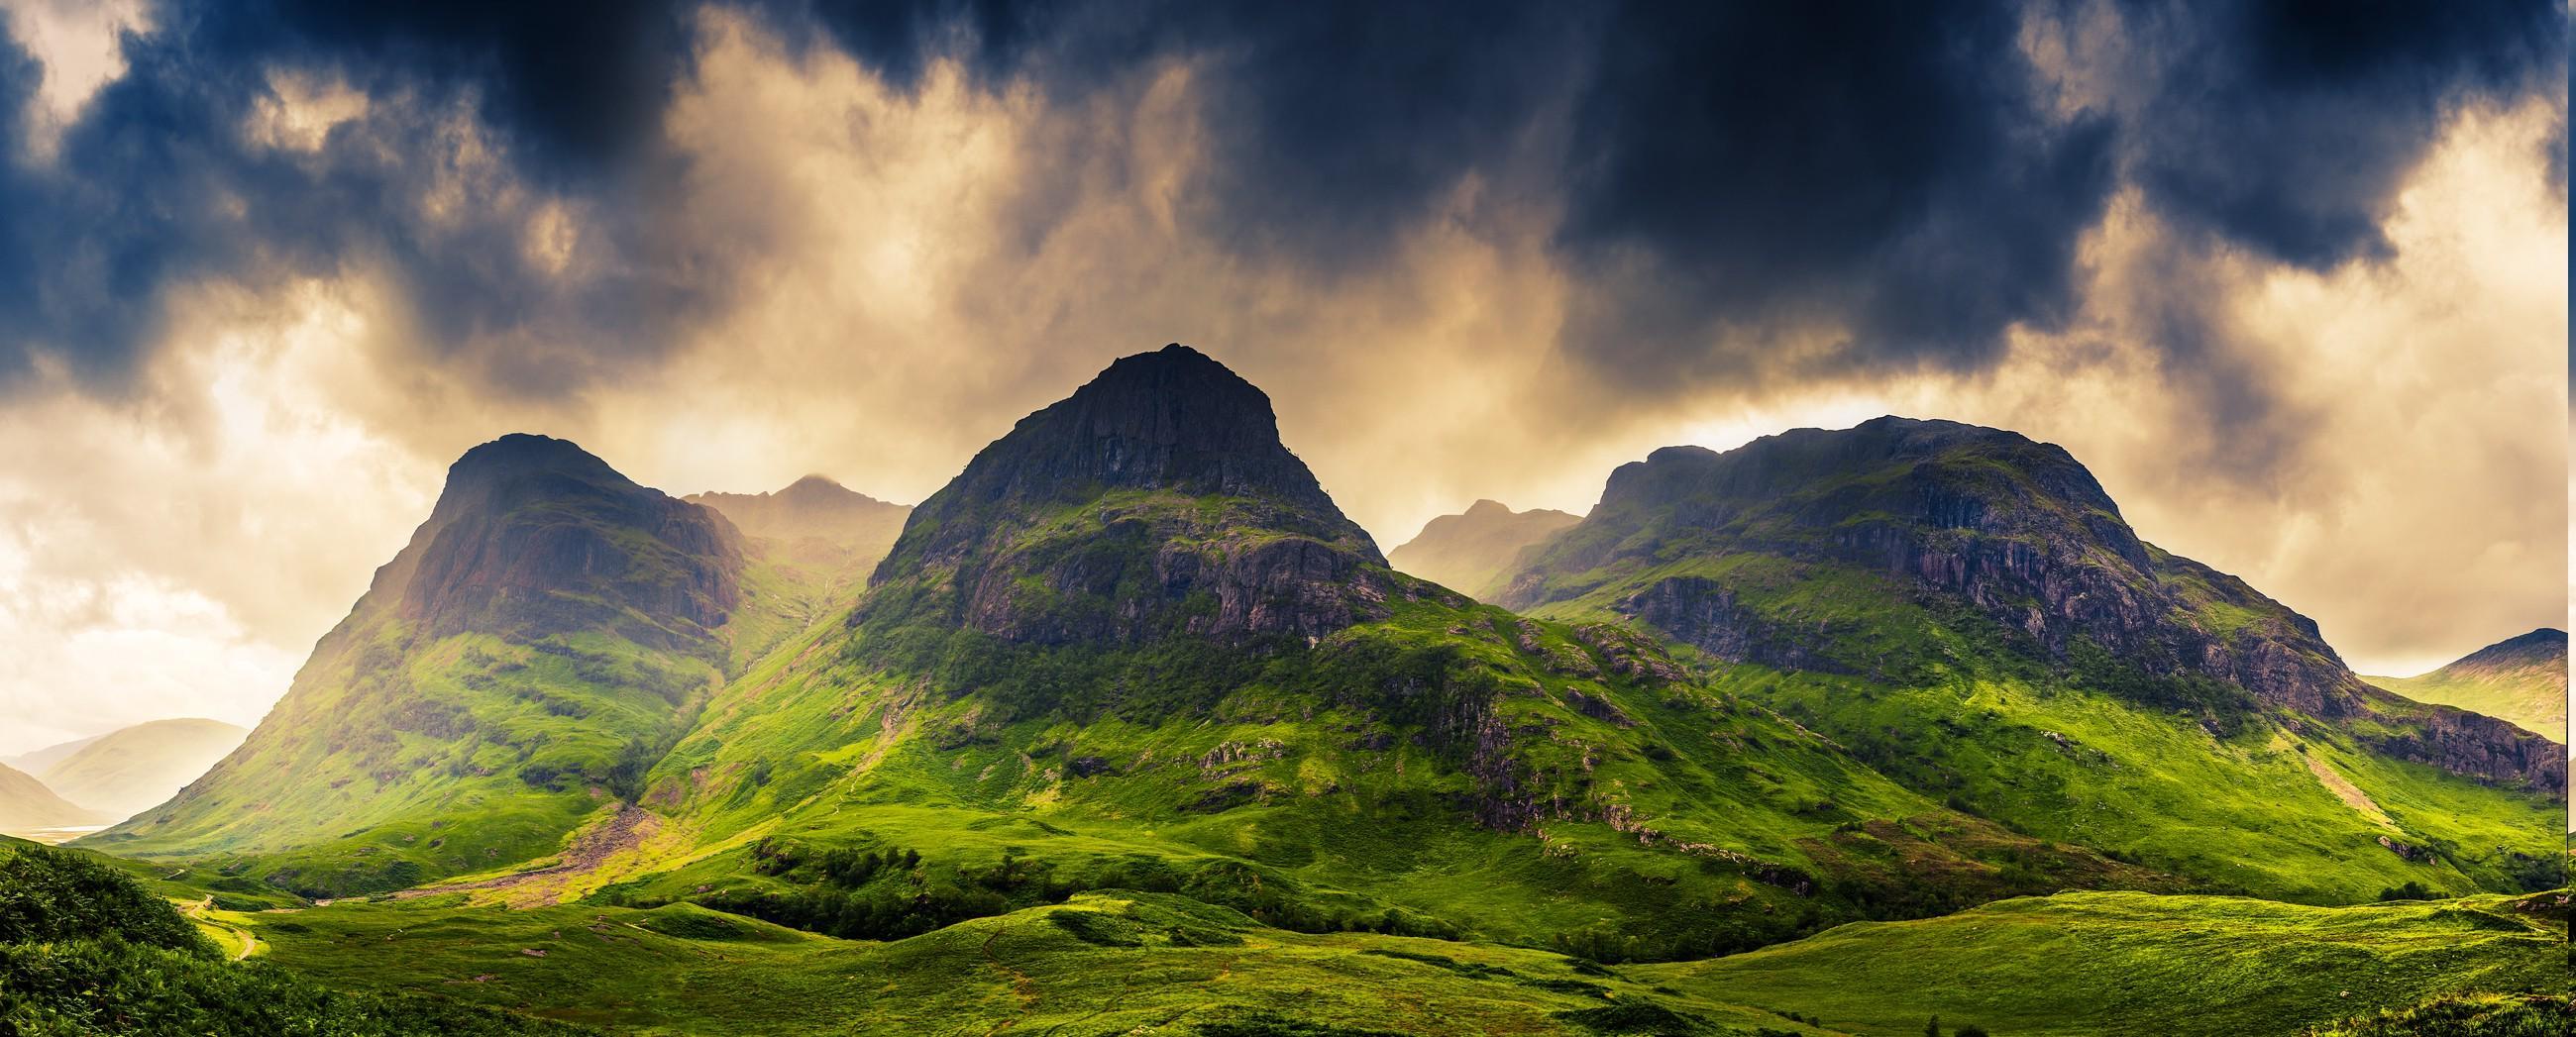 Scottish Highlands Wallpapers Wallpaper Cave